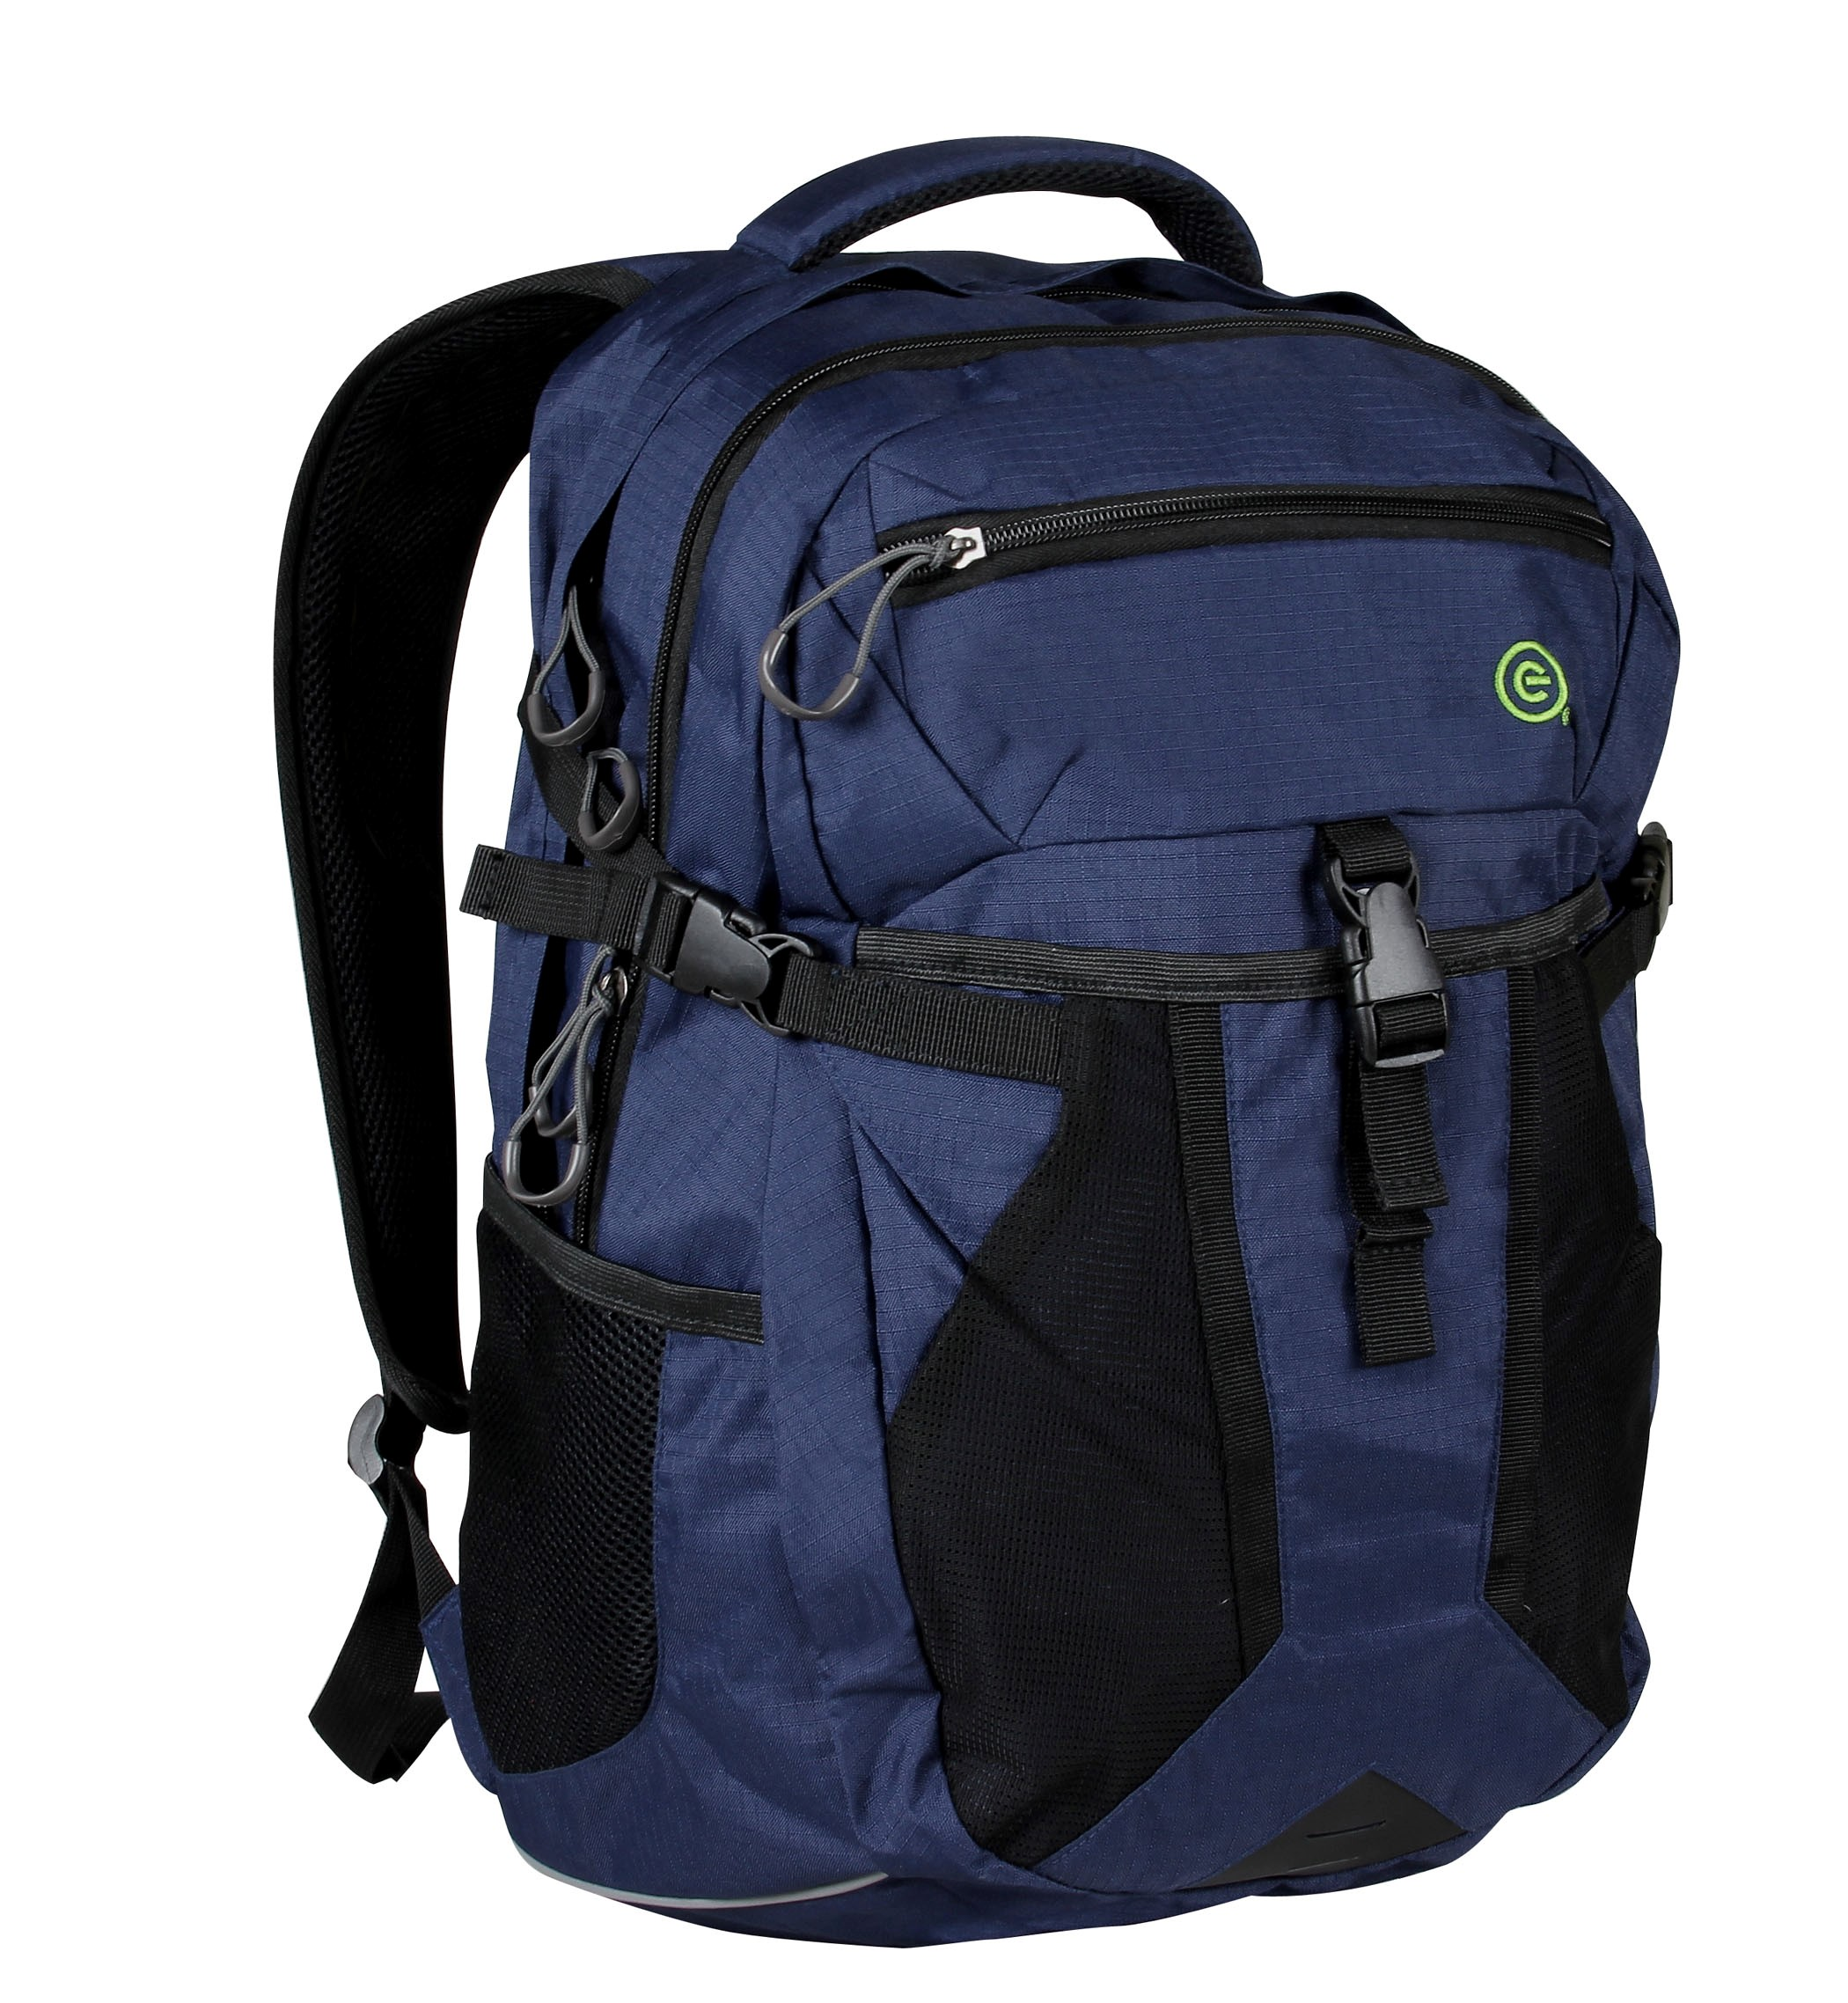 Ecogear BG-4081-EB Bighorn Recycled 17 Backpack, Egyptian Blue